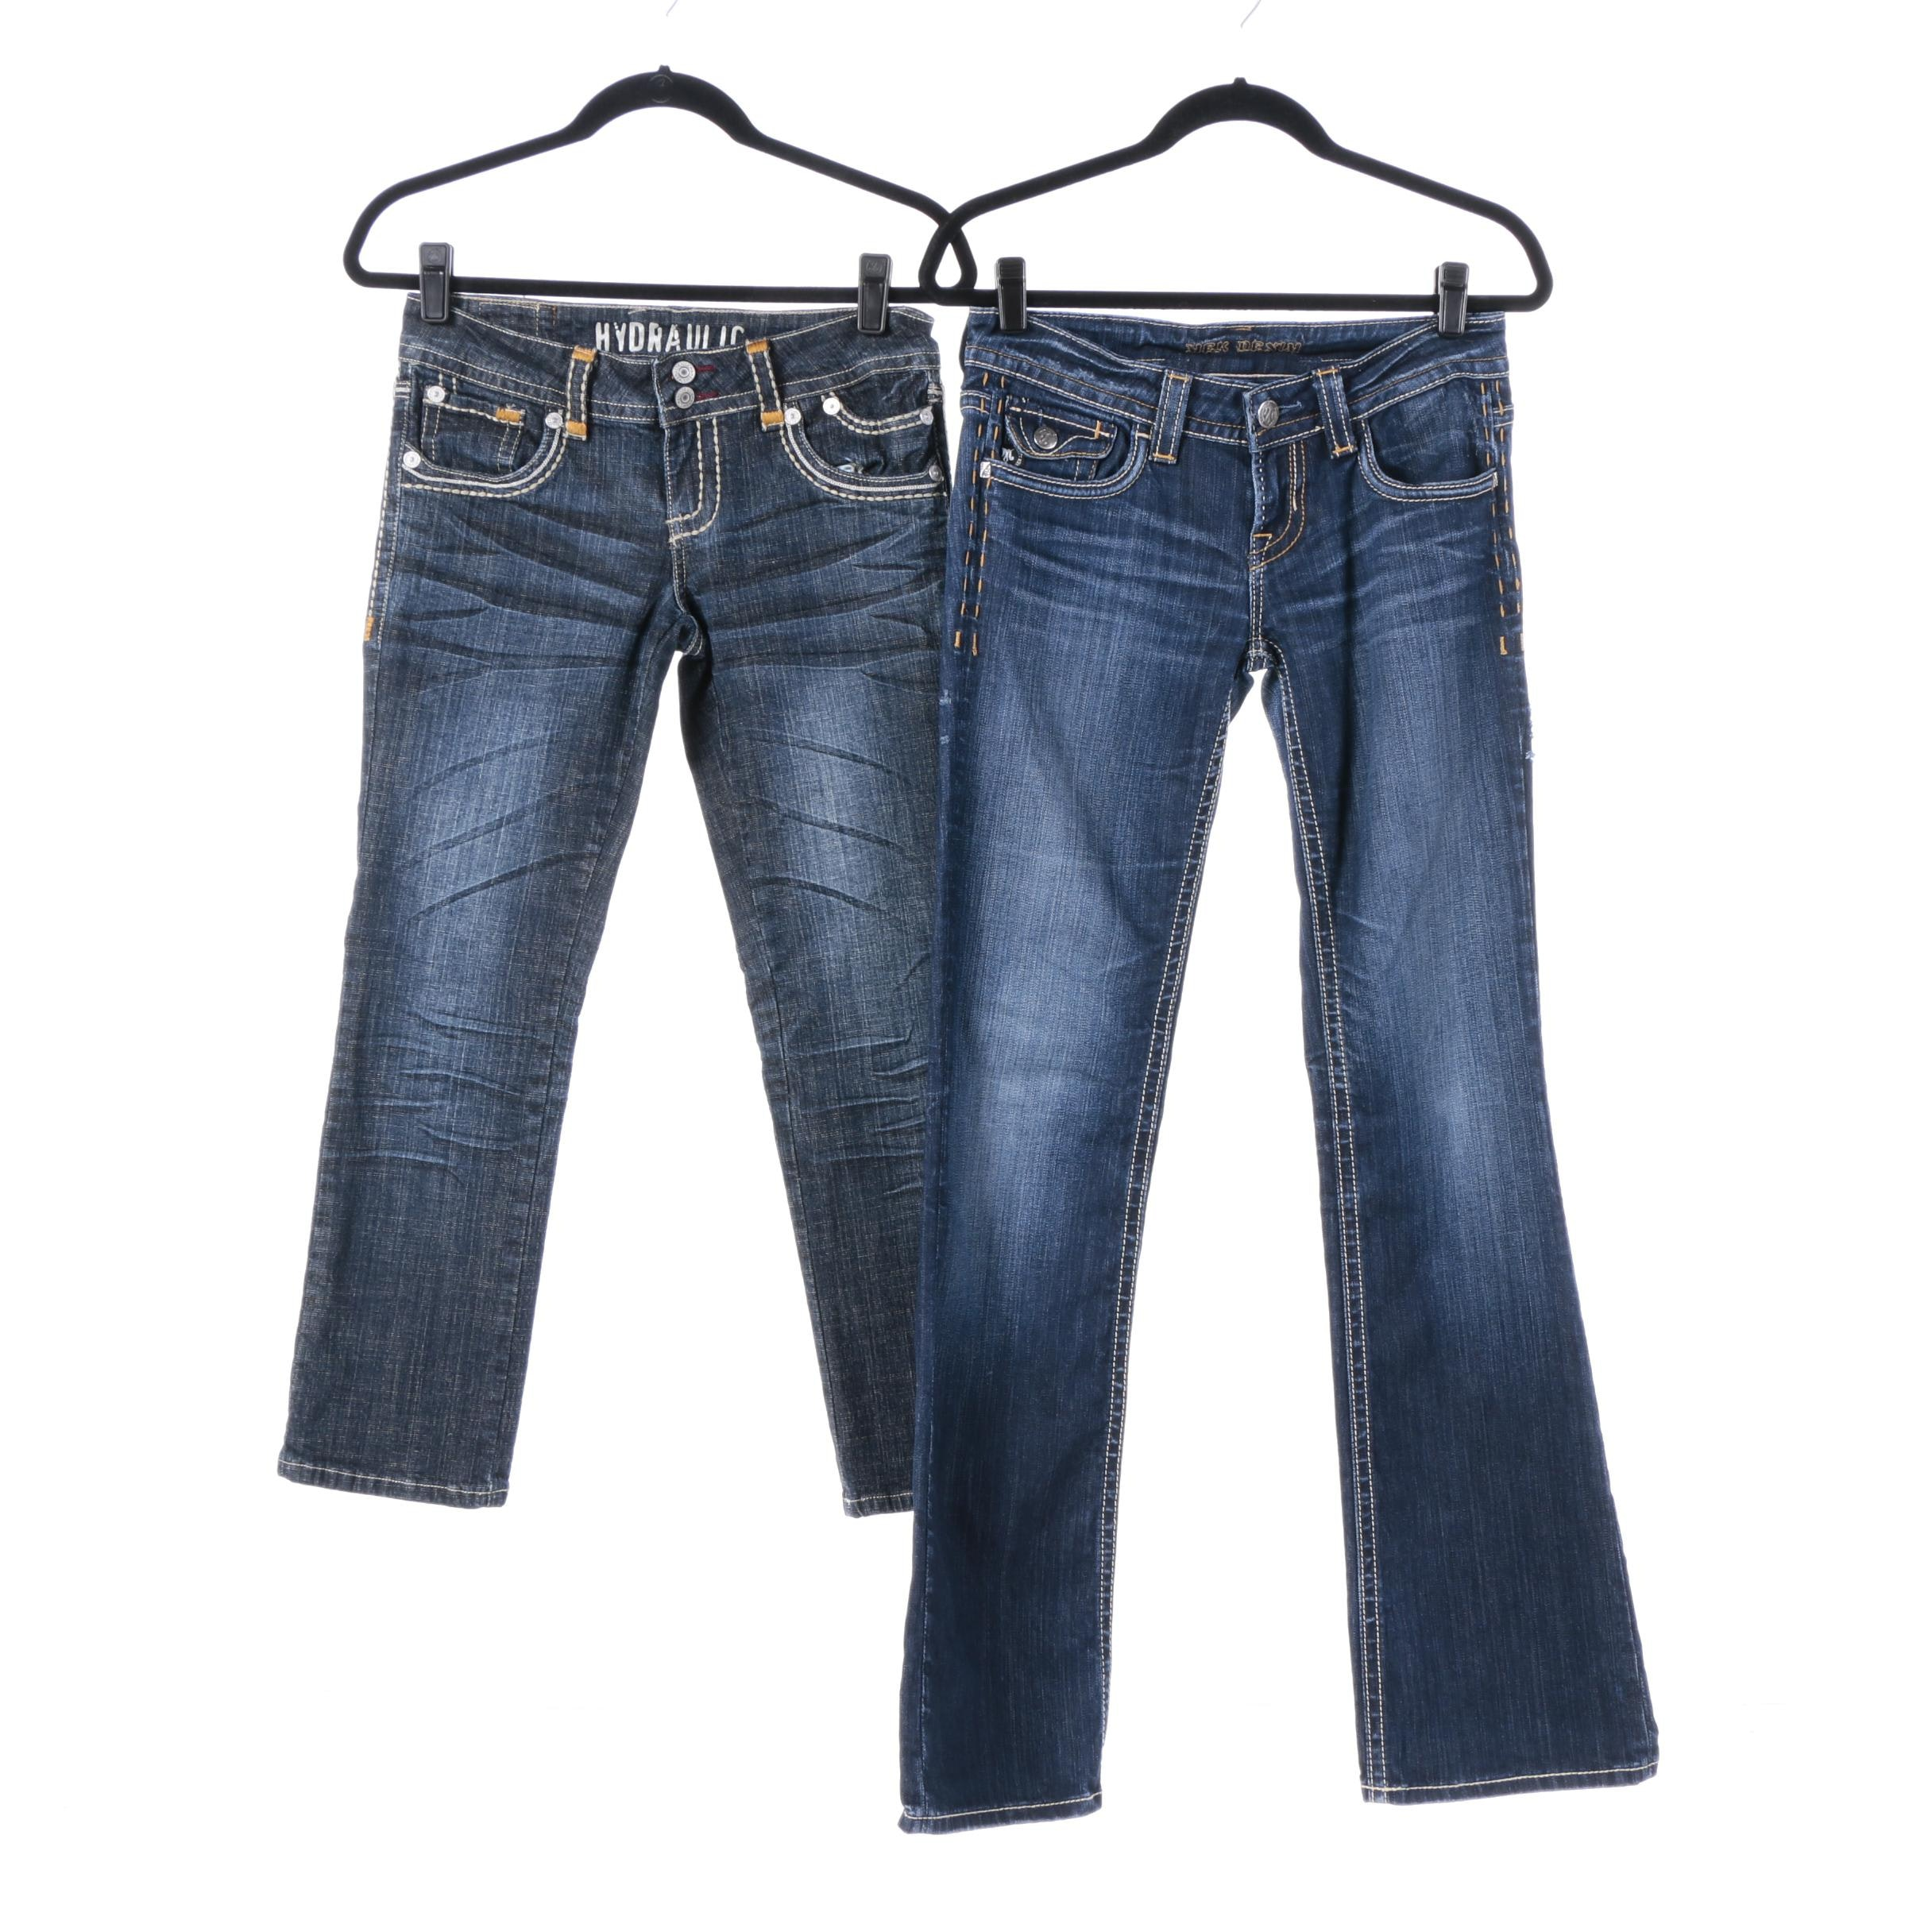 Women's Jeans Including Hydraulic and Mek Denim